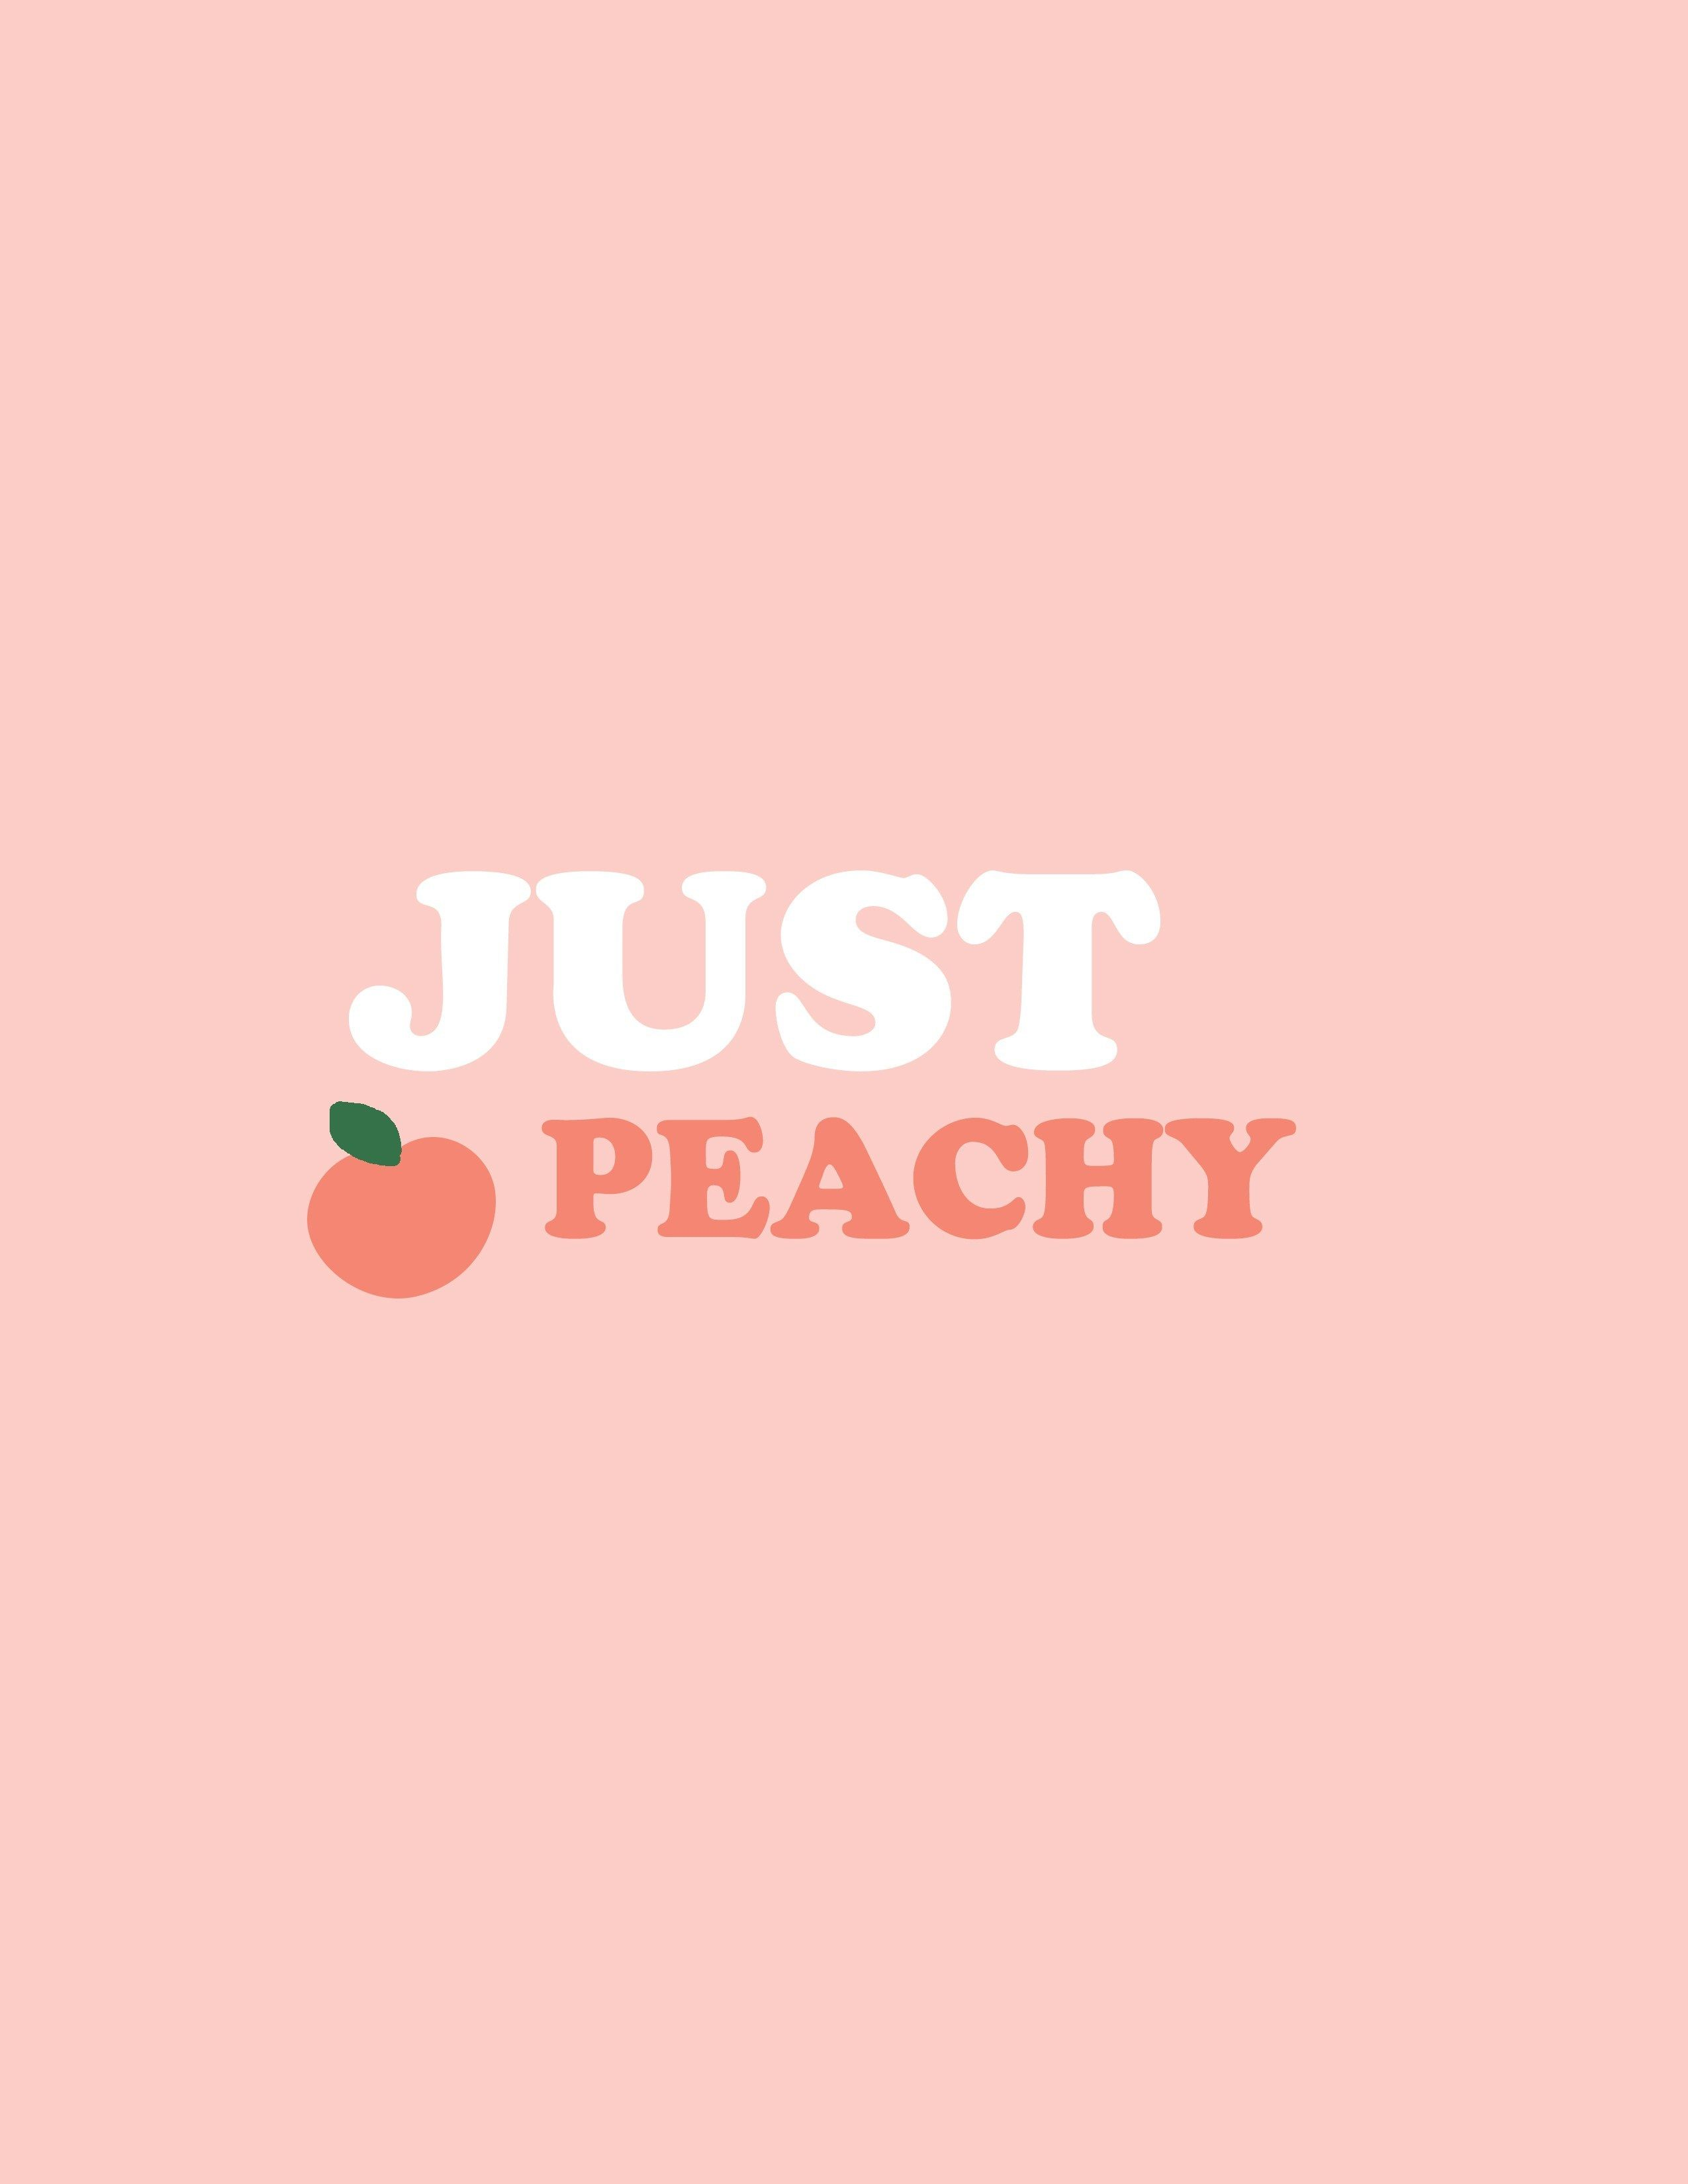 Peach Pink Aesthetic Wallpaper Laptop Aesthetic Peach Pink Wallpapers Wallpaper Cave aesthetic peach pink wallpapers